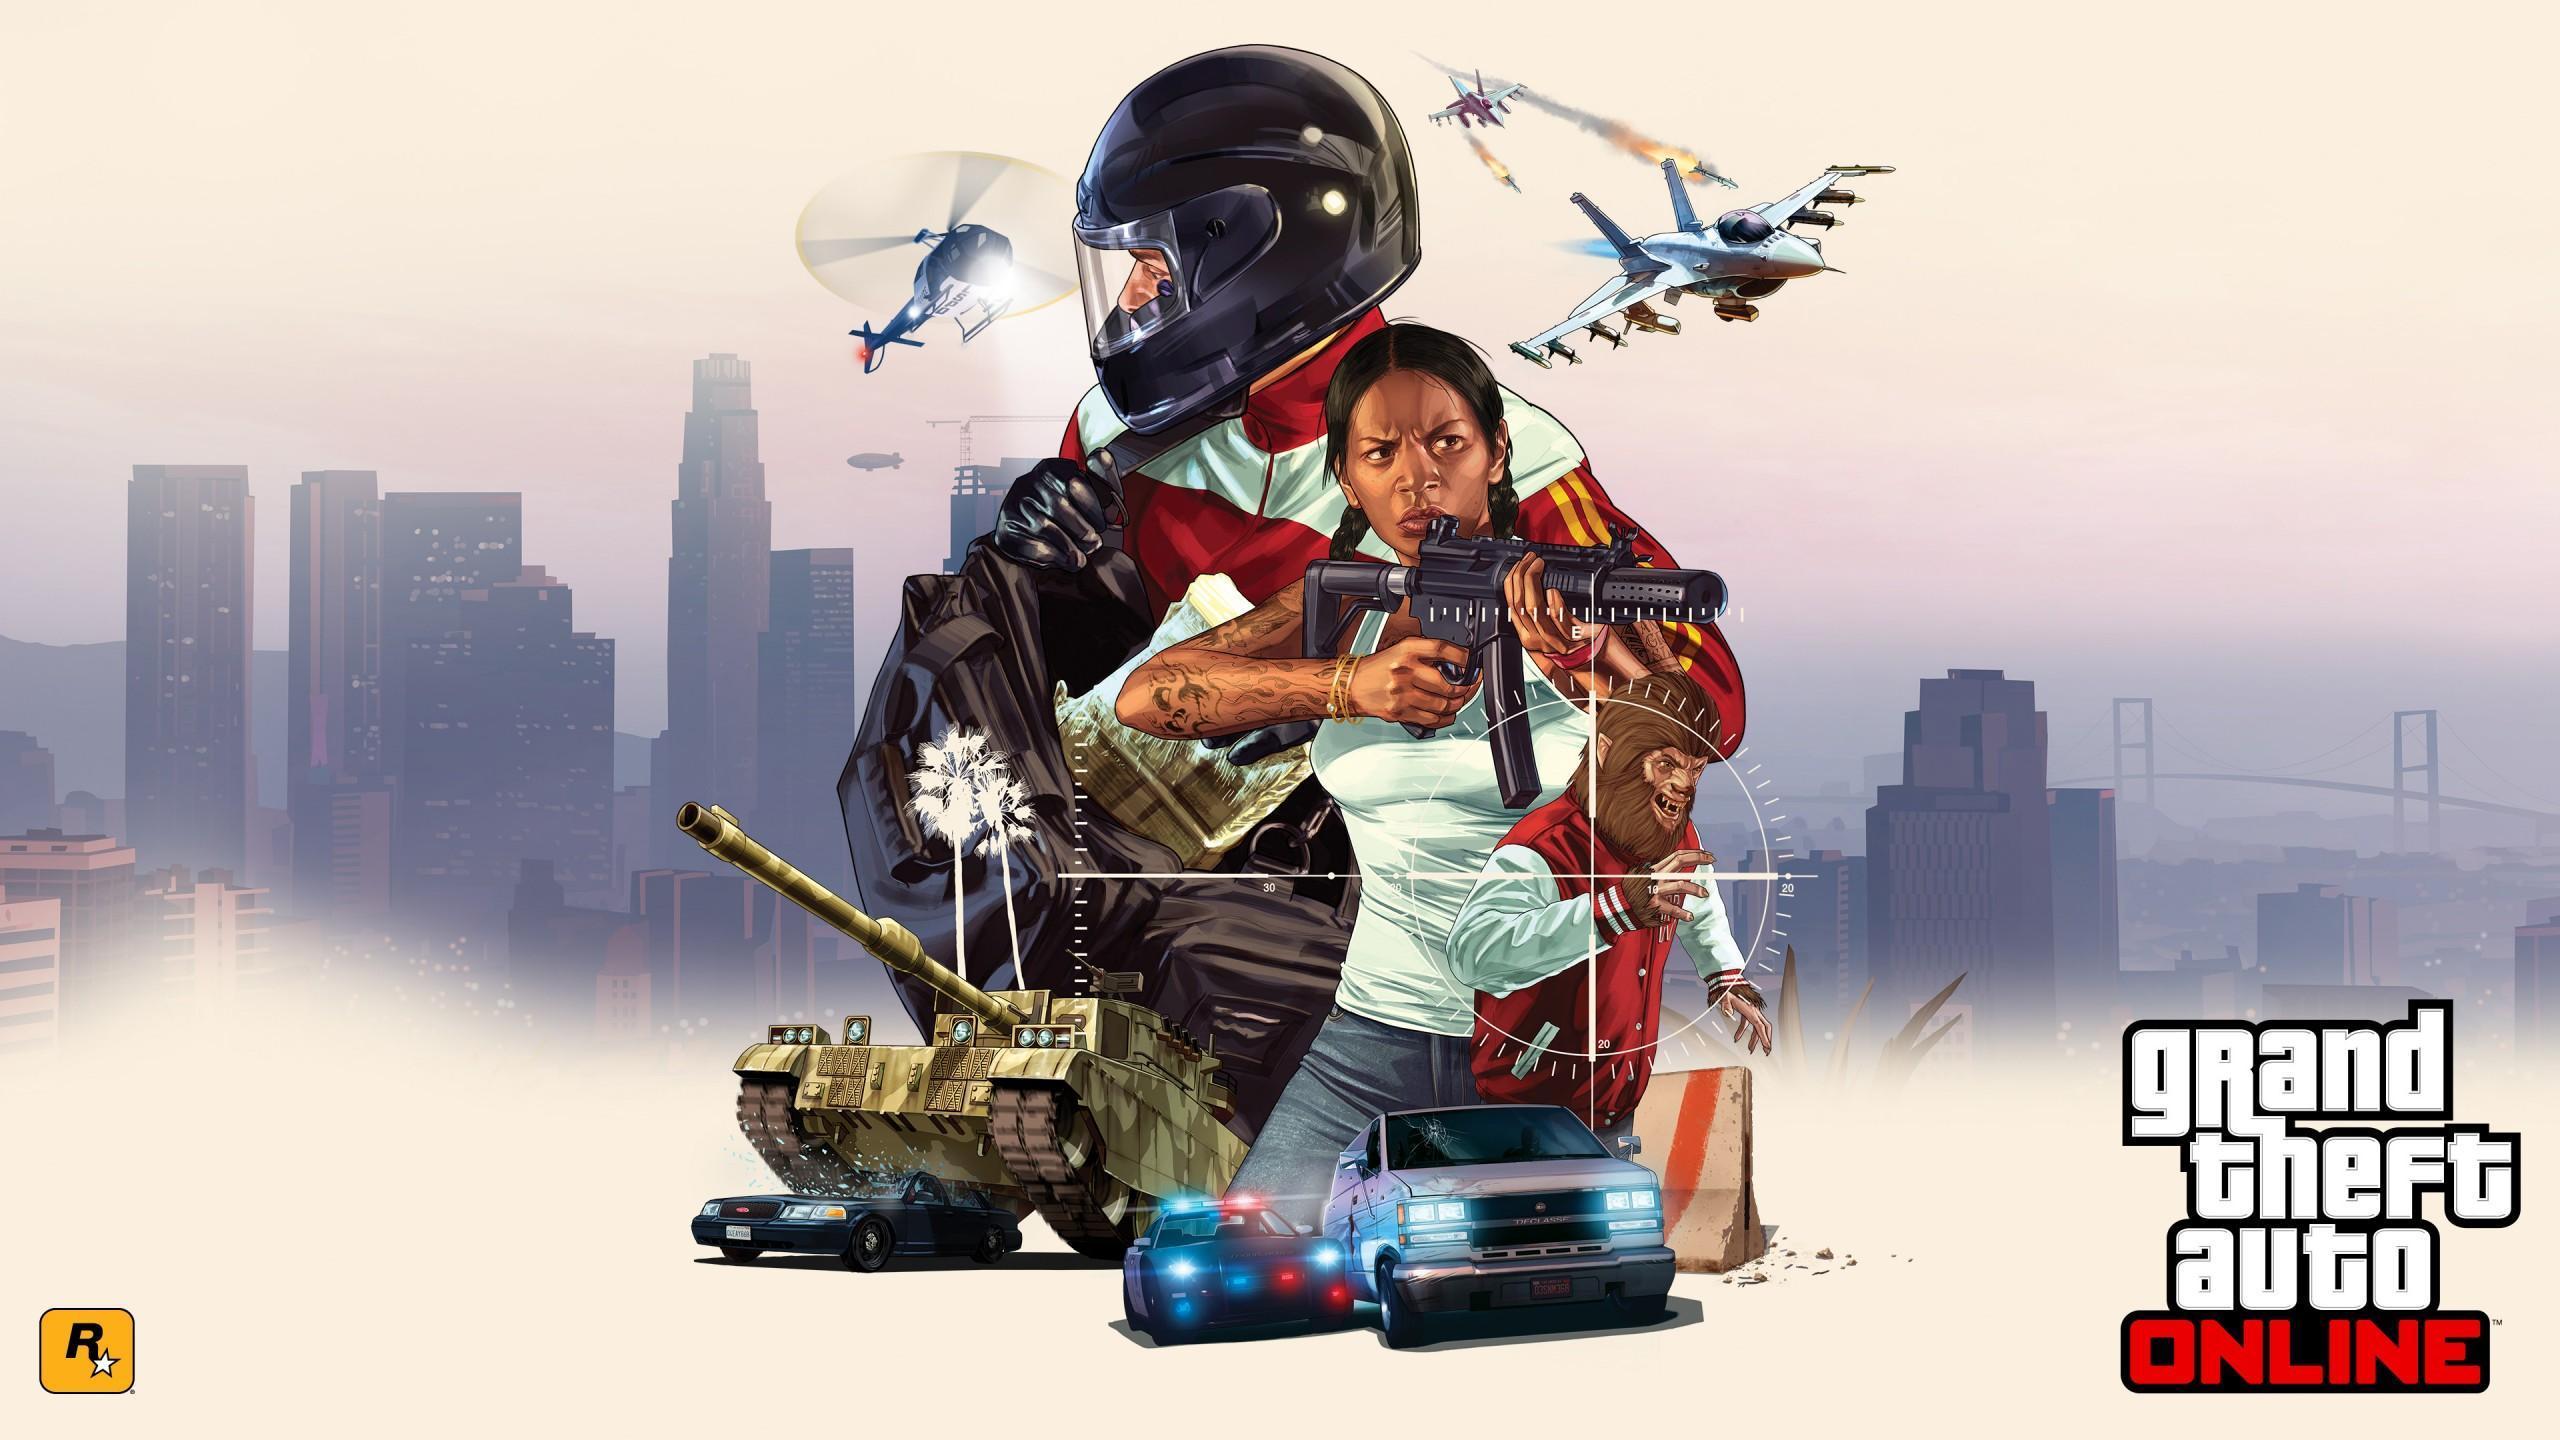 GTA Online Artworks - Grand Theft Auto V Artworks & Wallpapers